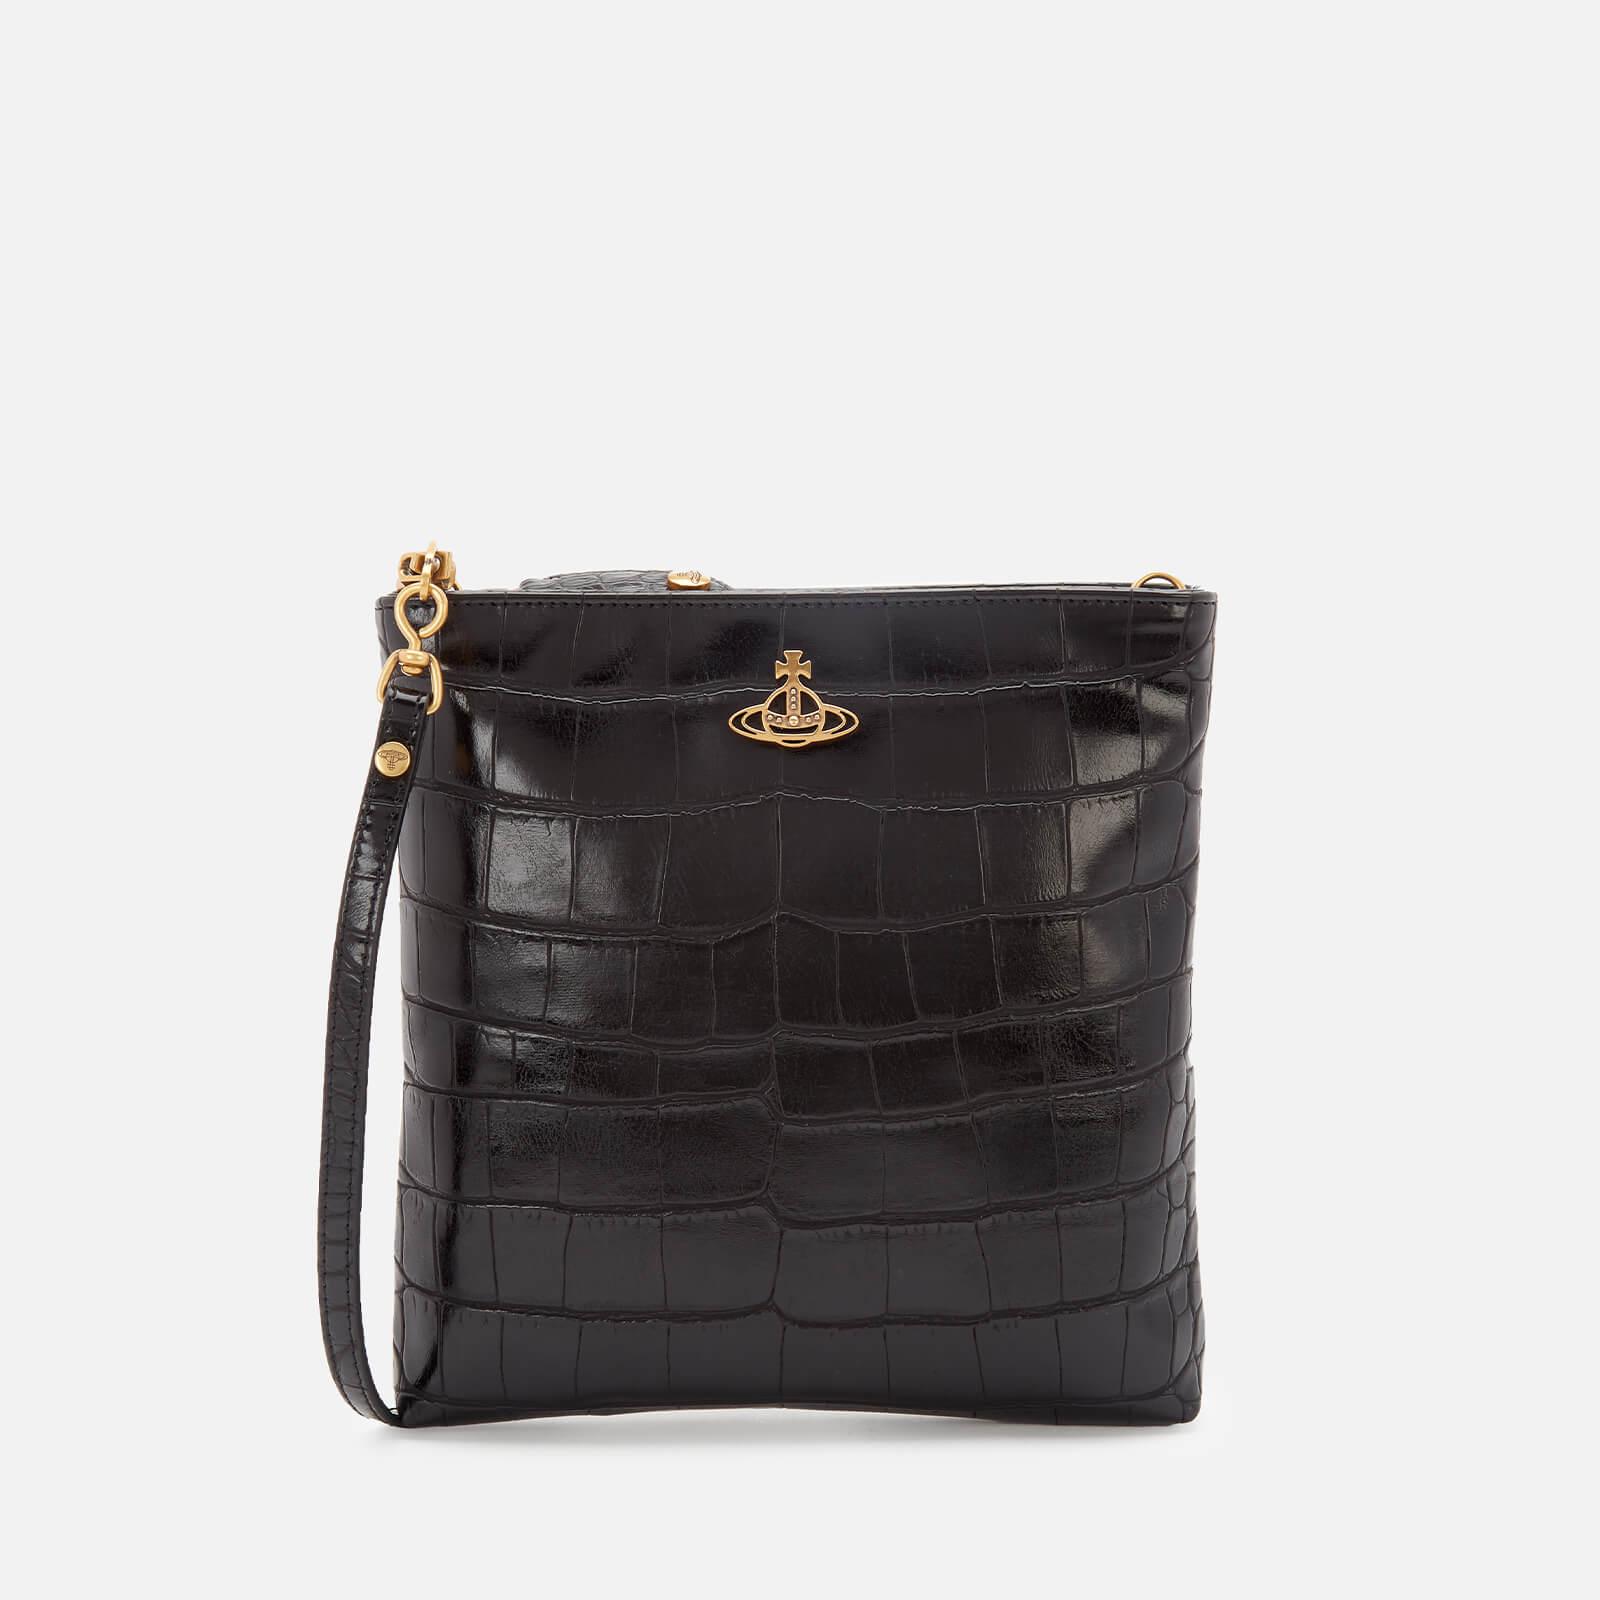 Vivienne Westwood Women's Johanna New Square Cross Body Bag - Black